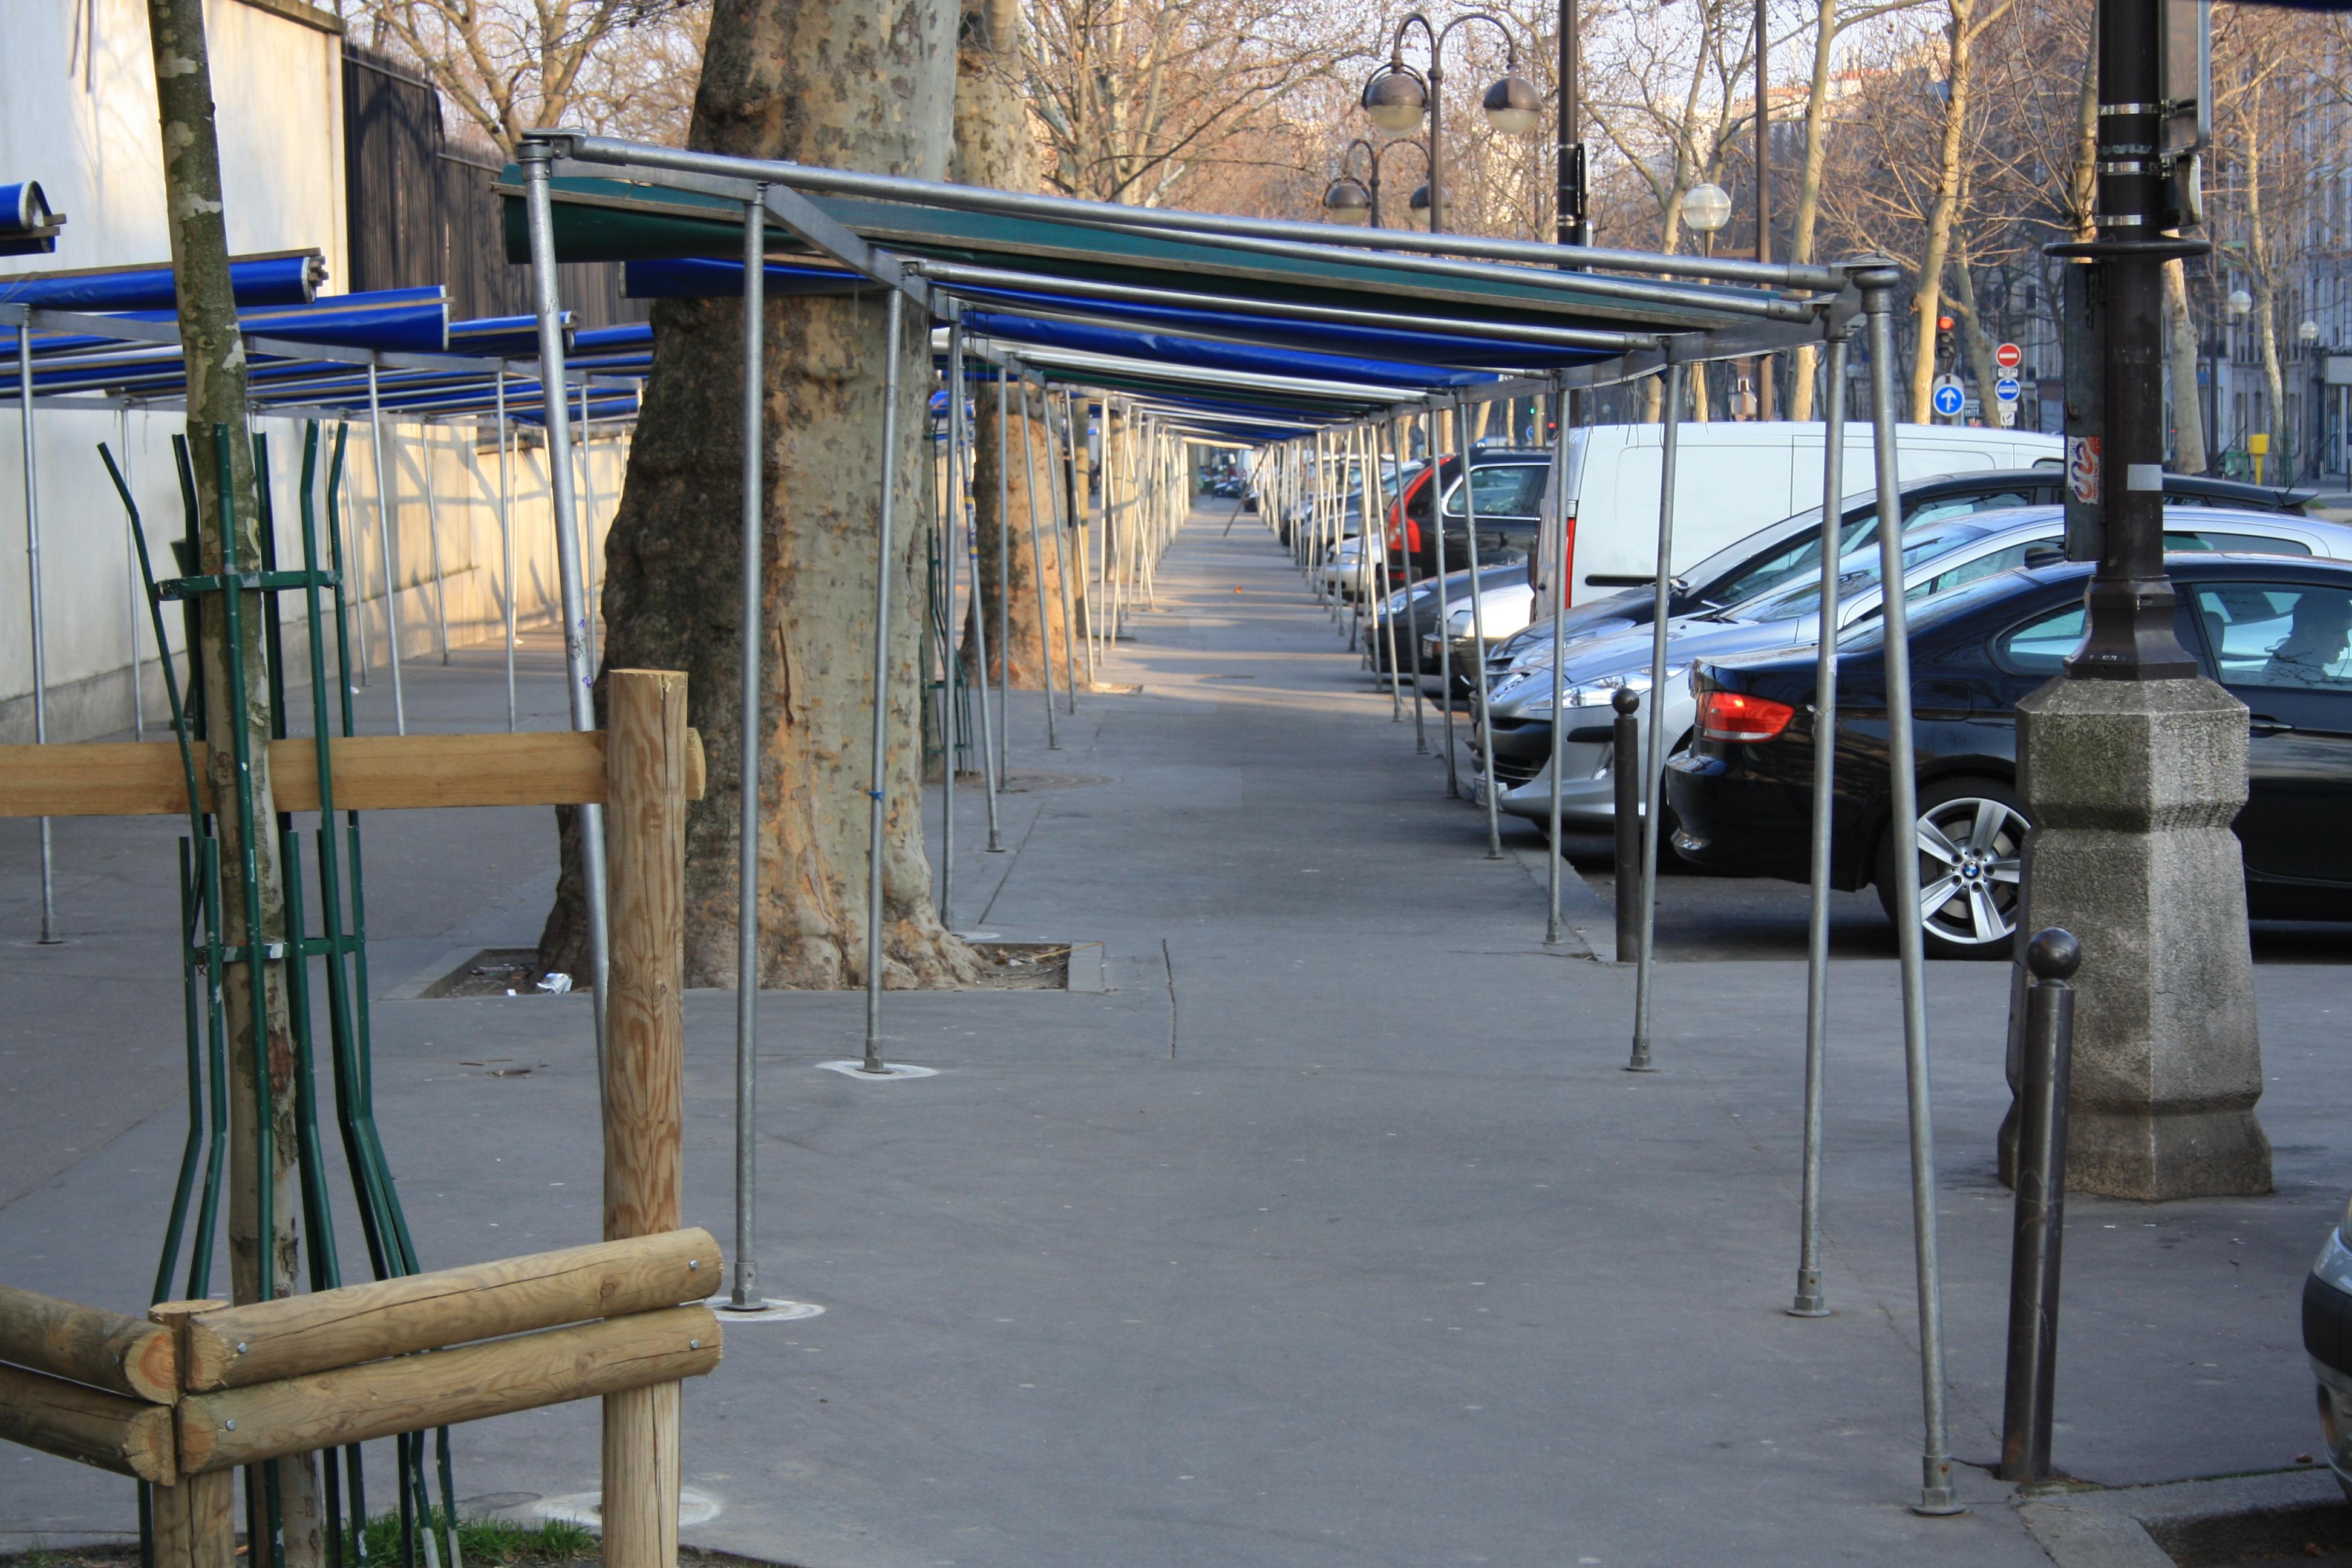 File:Empty market on the Boulevard de Port-Royal in Paris France.jpg ...